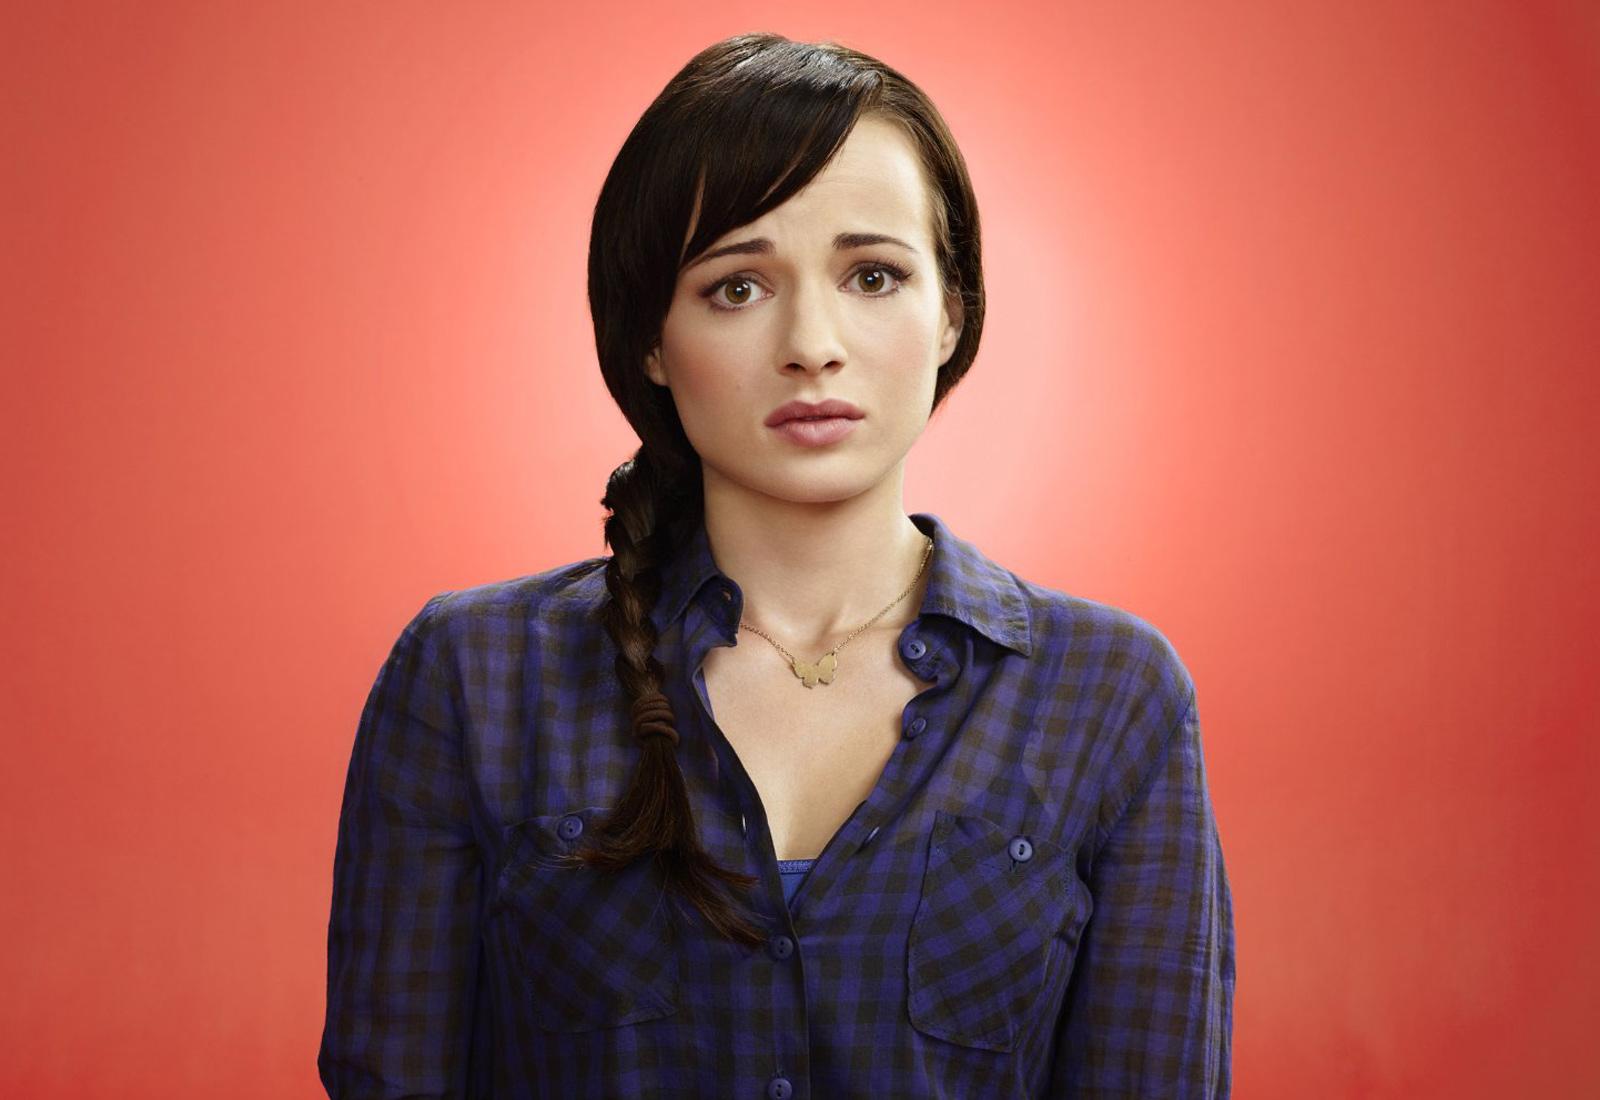 awkward season 2 episode 6 watch online free